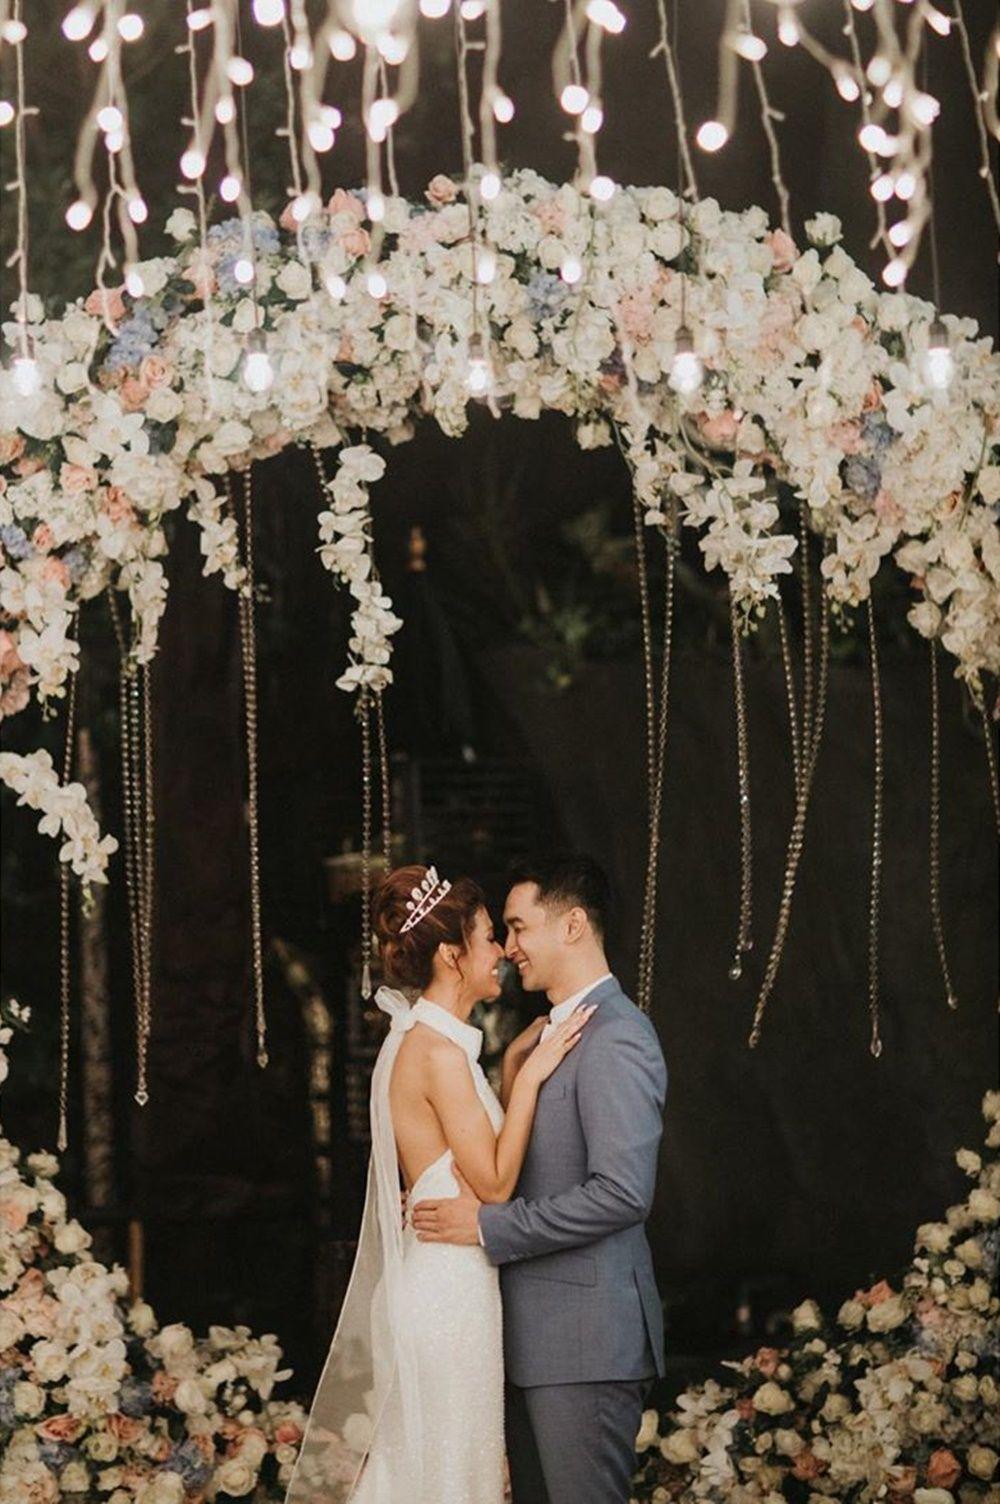 Penuh Bahagia, Intip 9 Momen Pernikahan Gerald Yohanes dan Mezty Mez